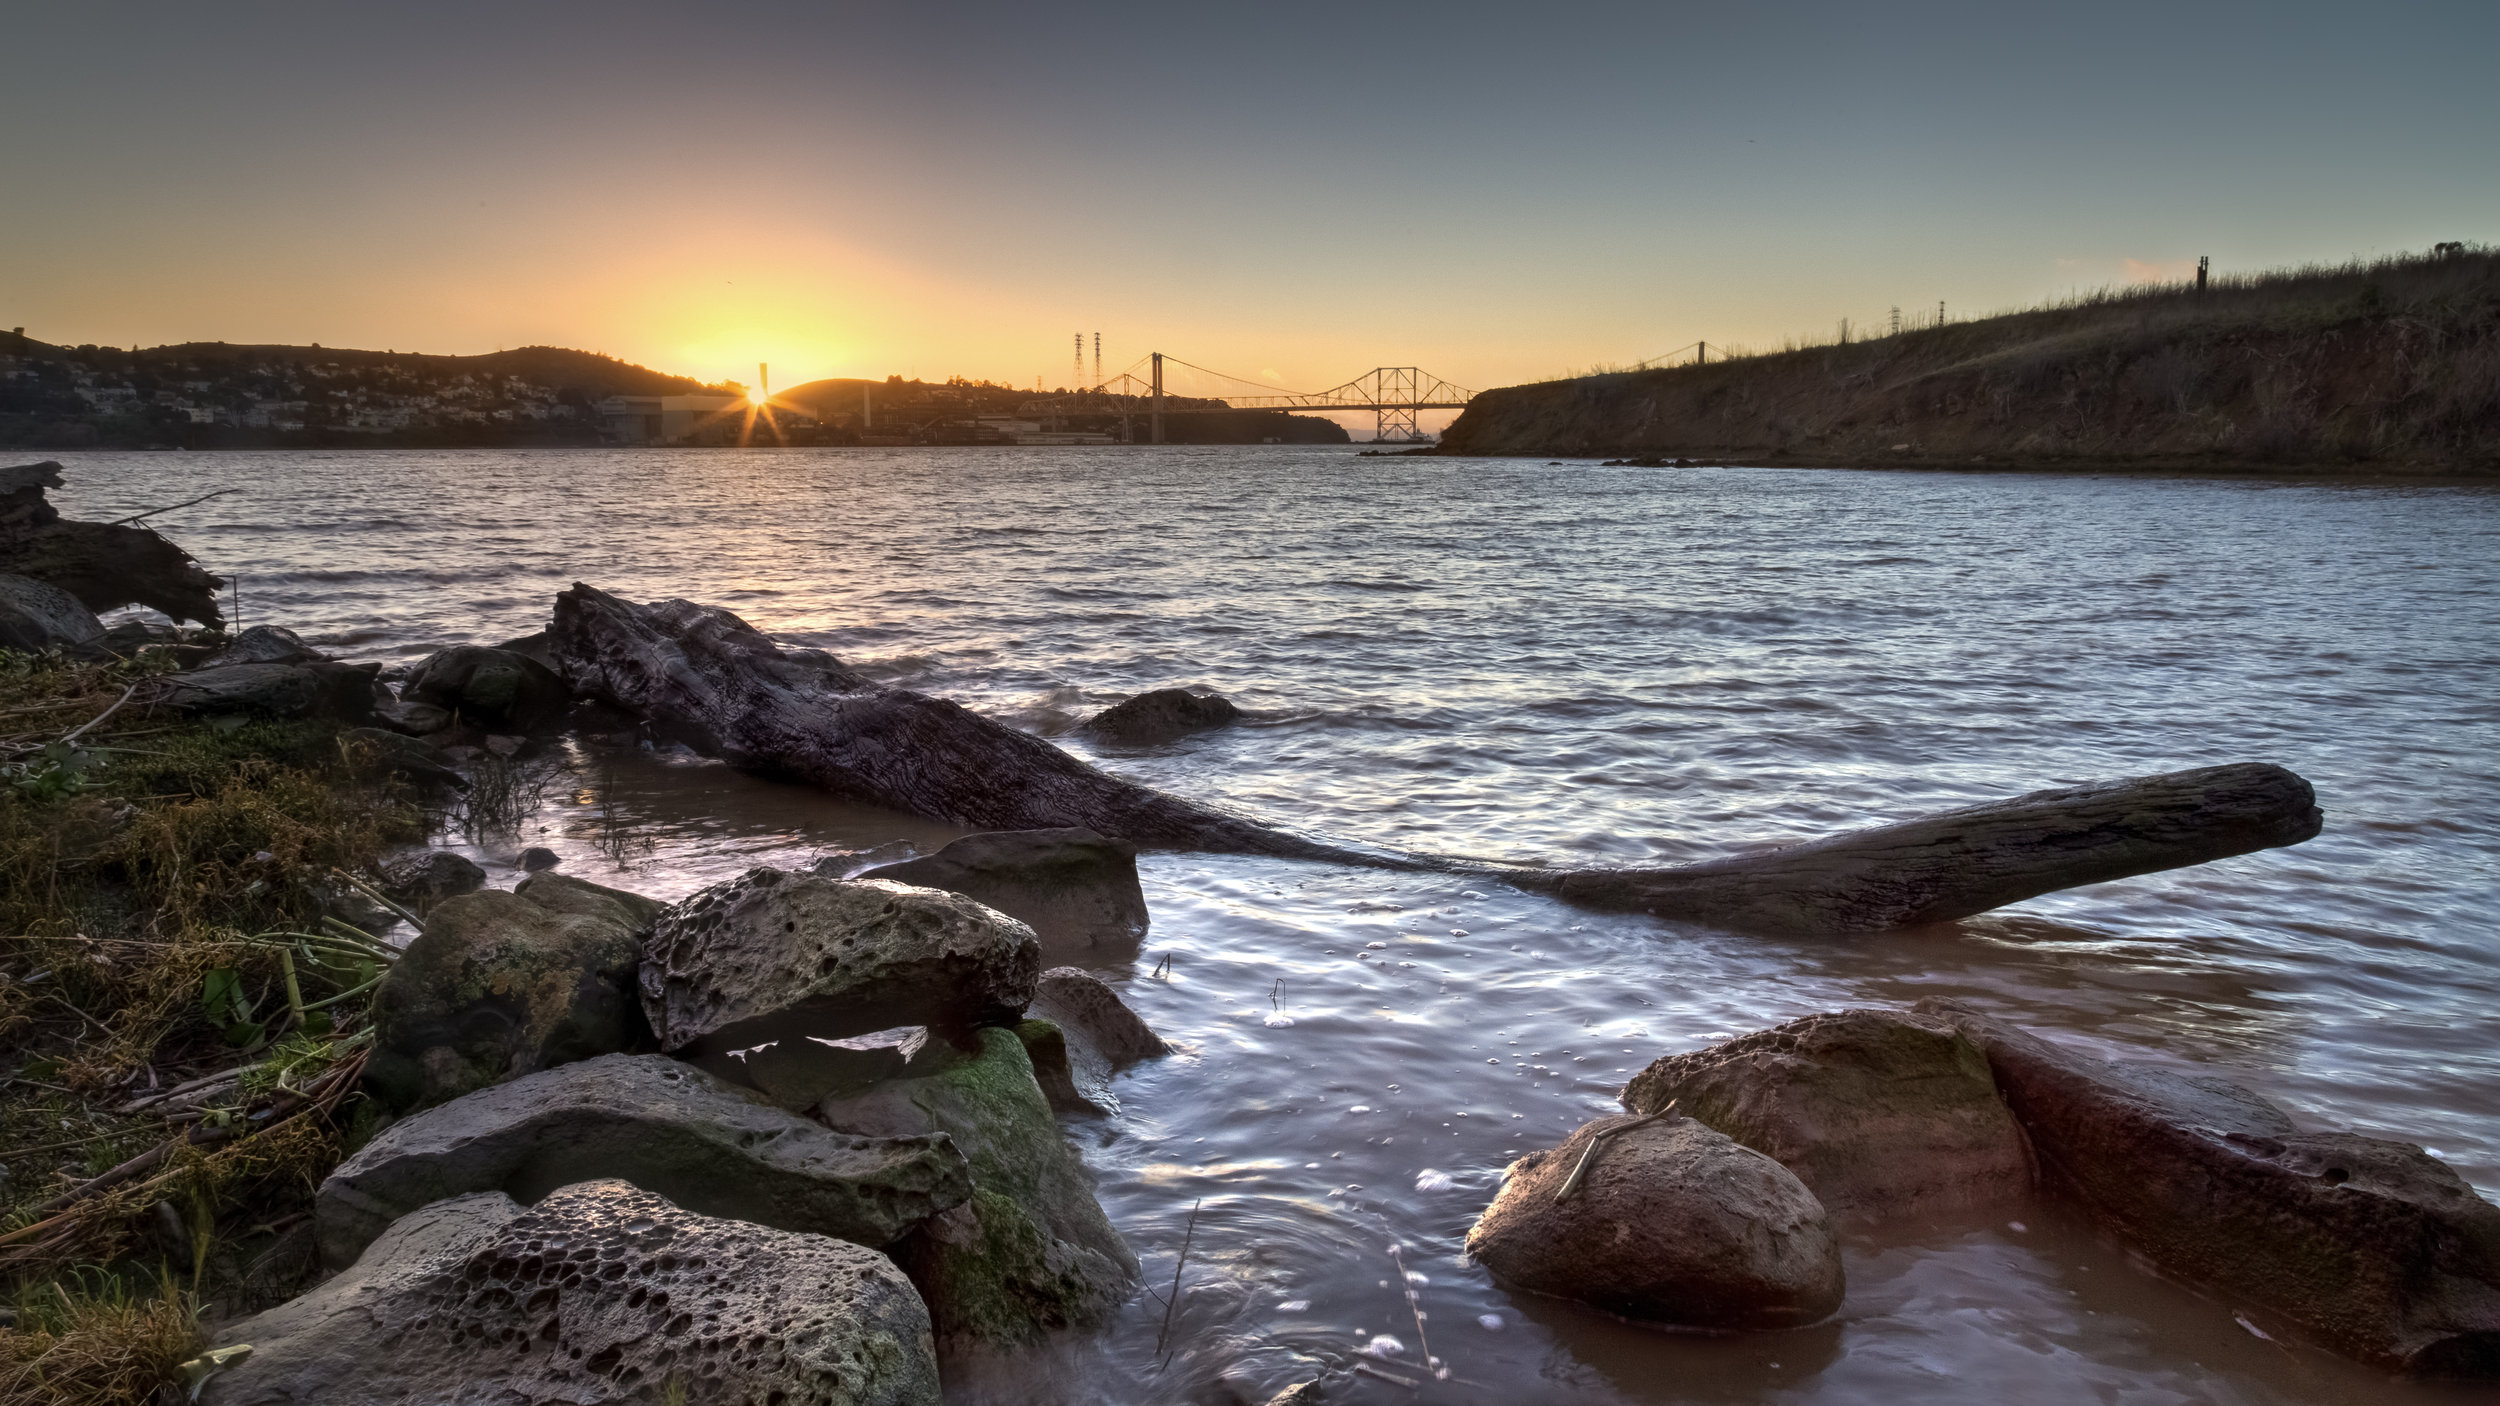 Glen-Cove-HDR-4.jpg